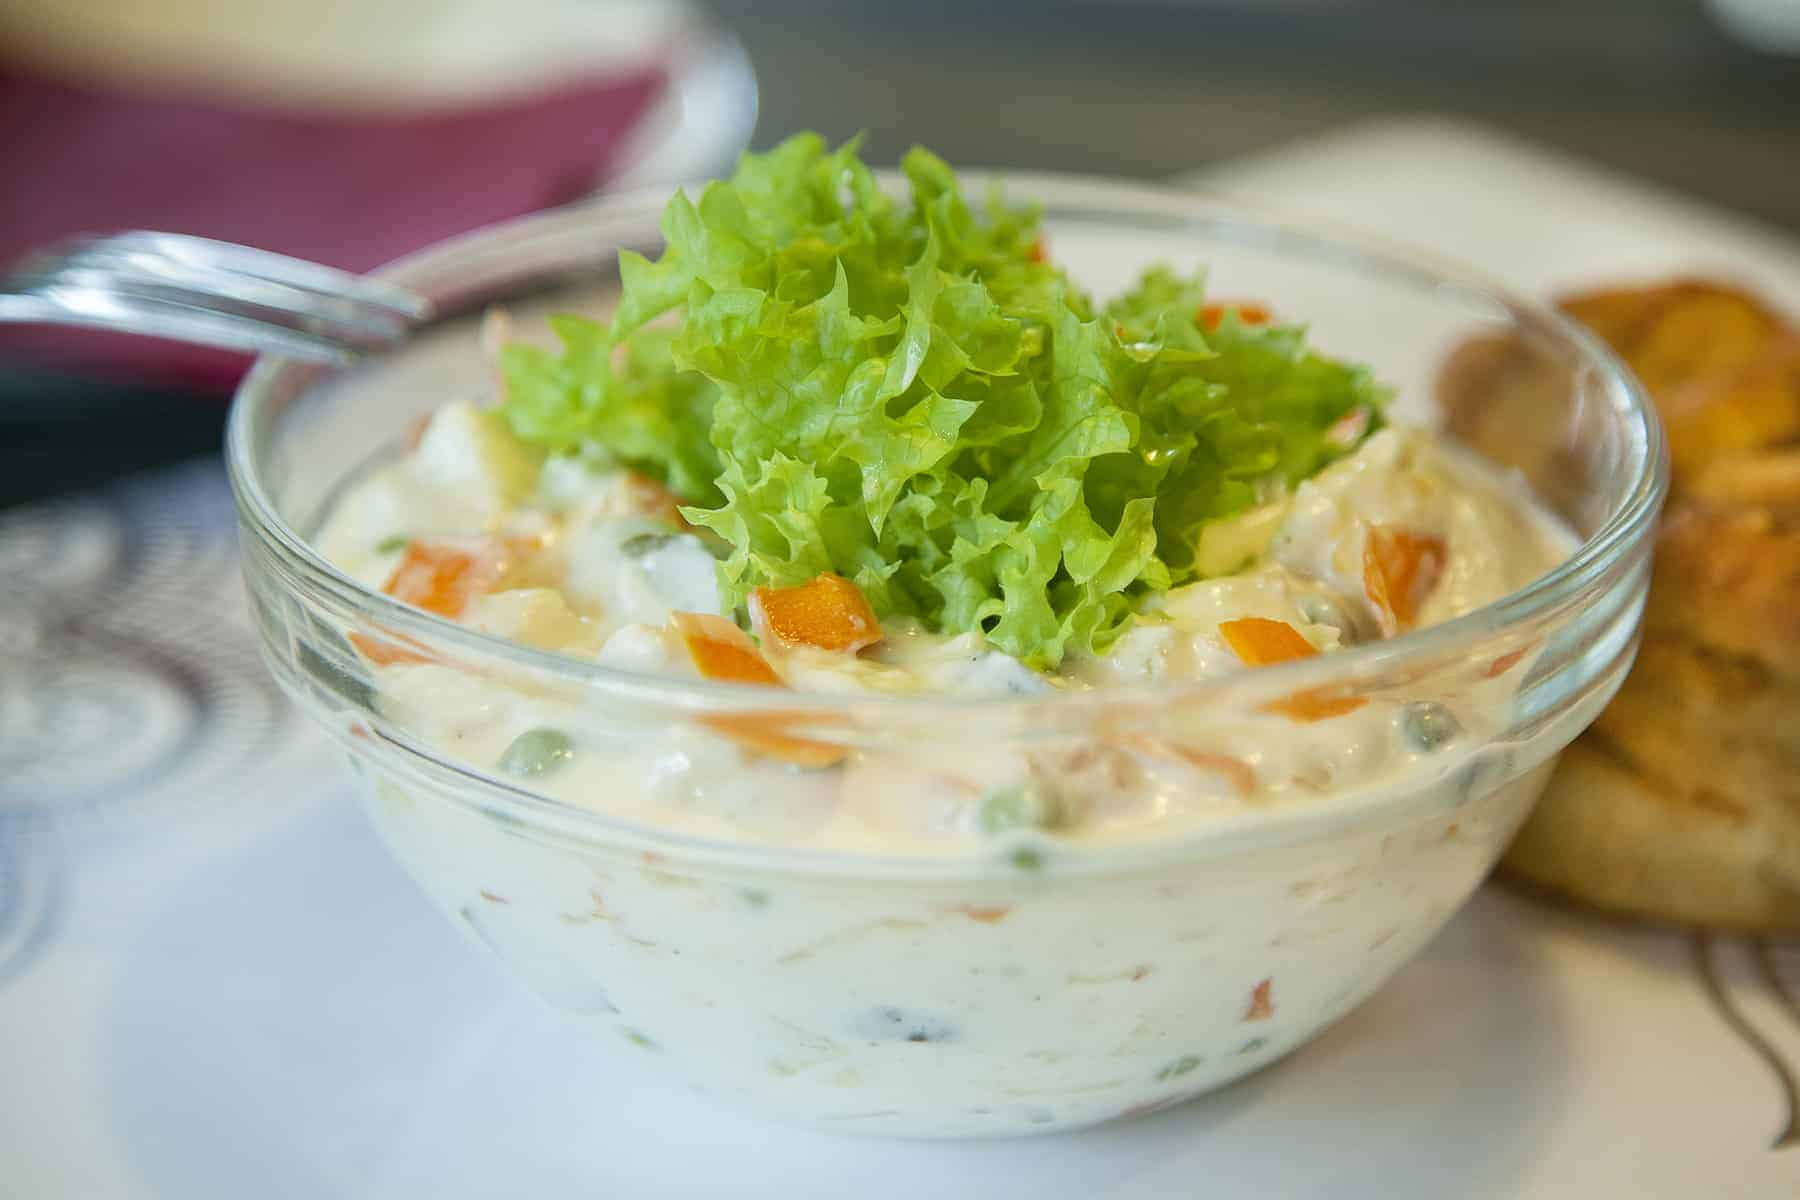 vegan-majonezes-francia-salata-napfenyes-cukraszat